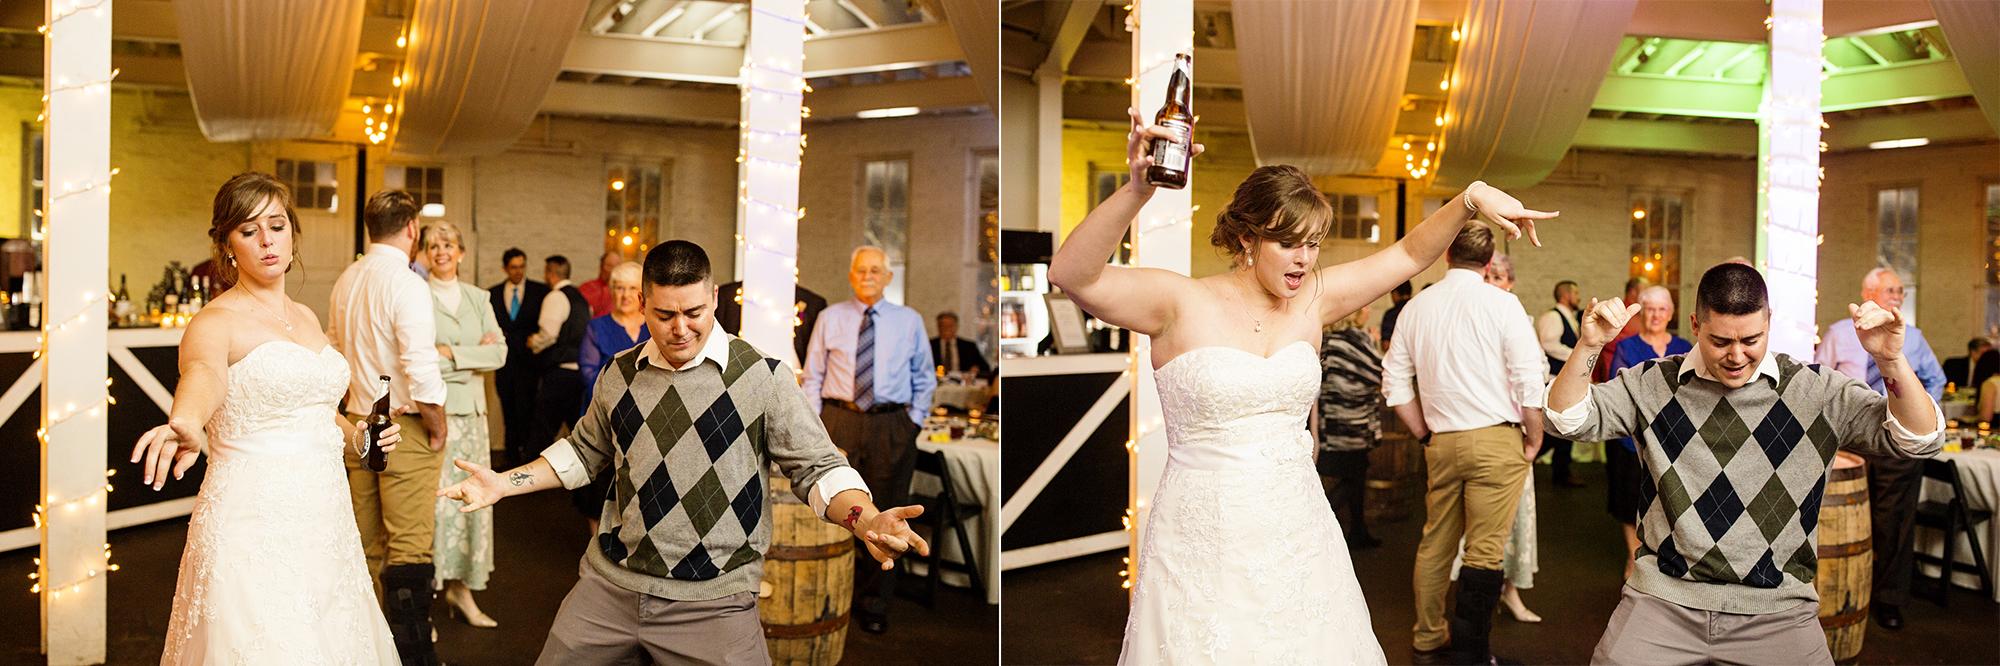 Seriously_Sabrina_Photography_Lexington_Kentucky_21c_Round_Barn_Red_Mile_Wedding_Gorley_134.jpg